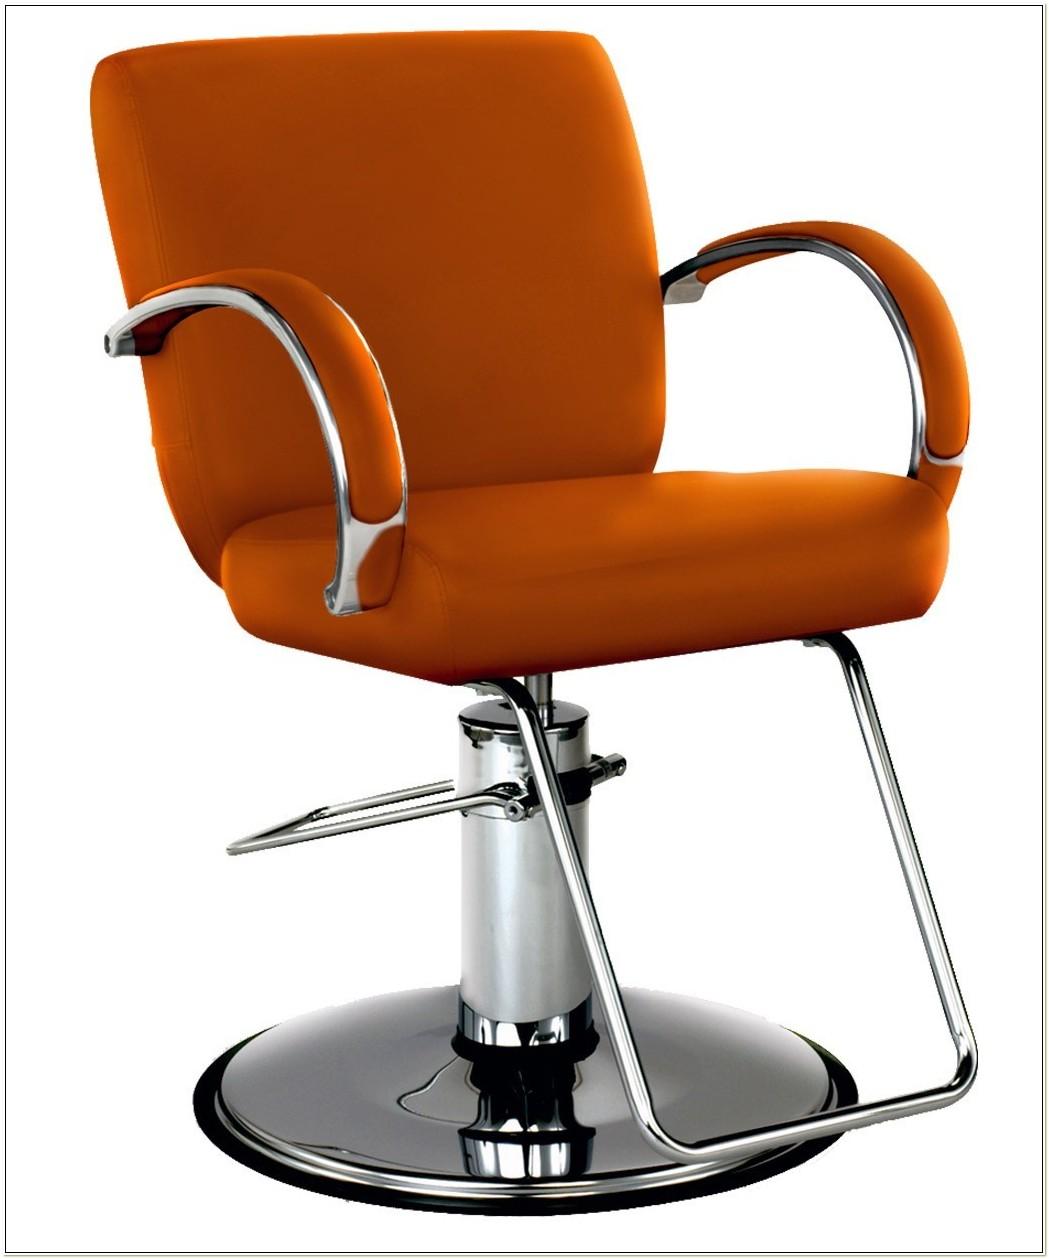 Takara Belmont Salon Chairs